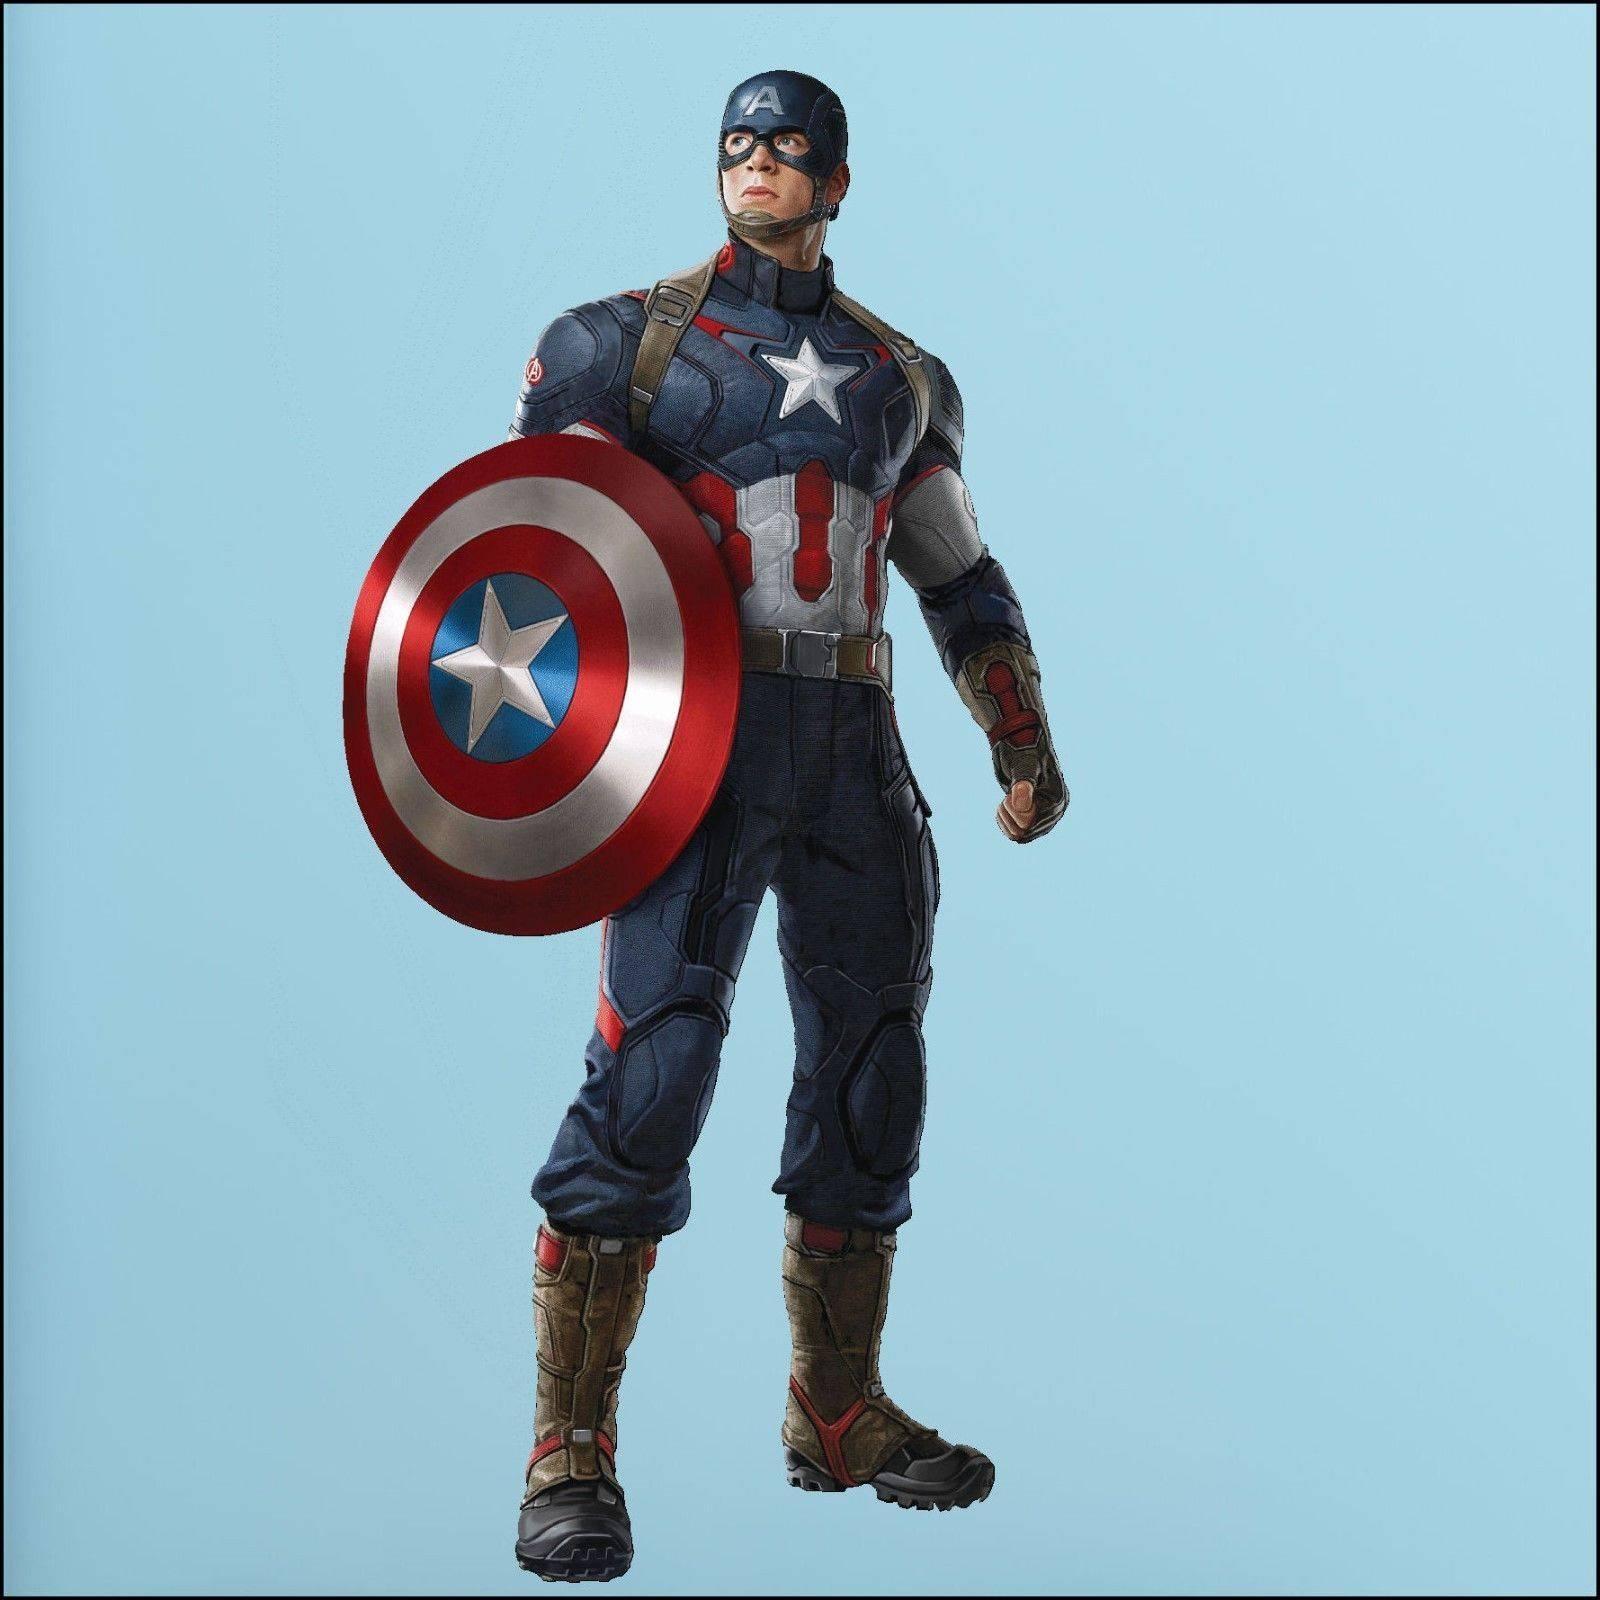 Captain America Avengers Photo Quality 3D Wall Sticker Art Mural Inside 2017 Captain America 3D Wall Art (View 15 of 20)